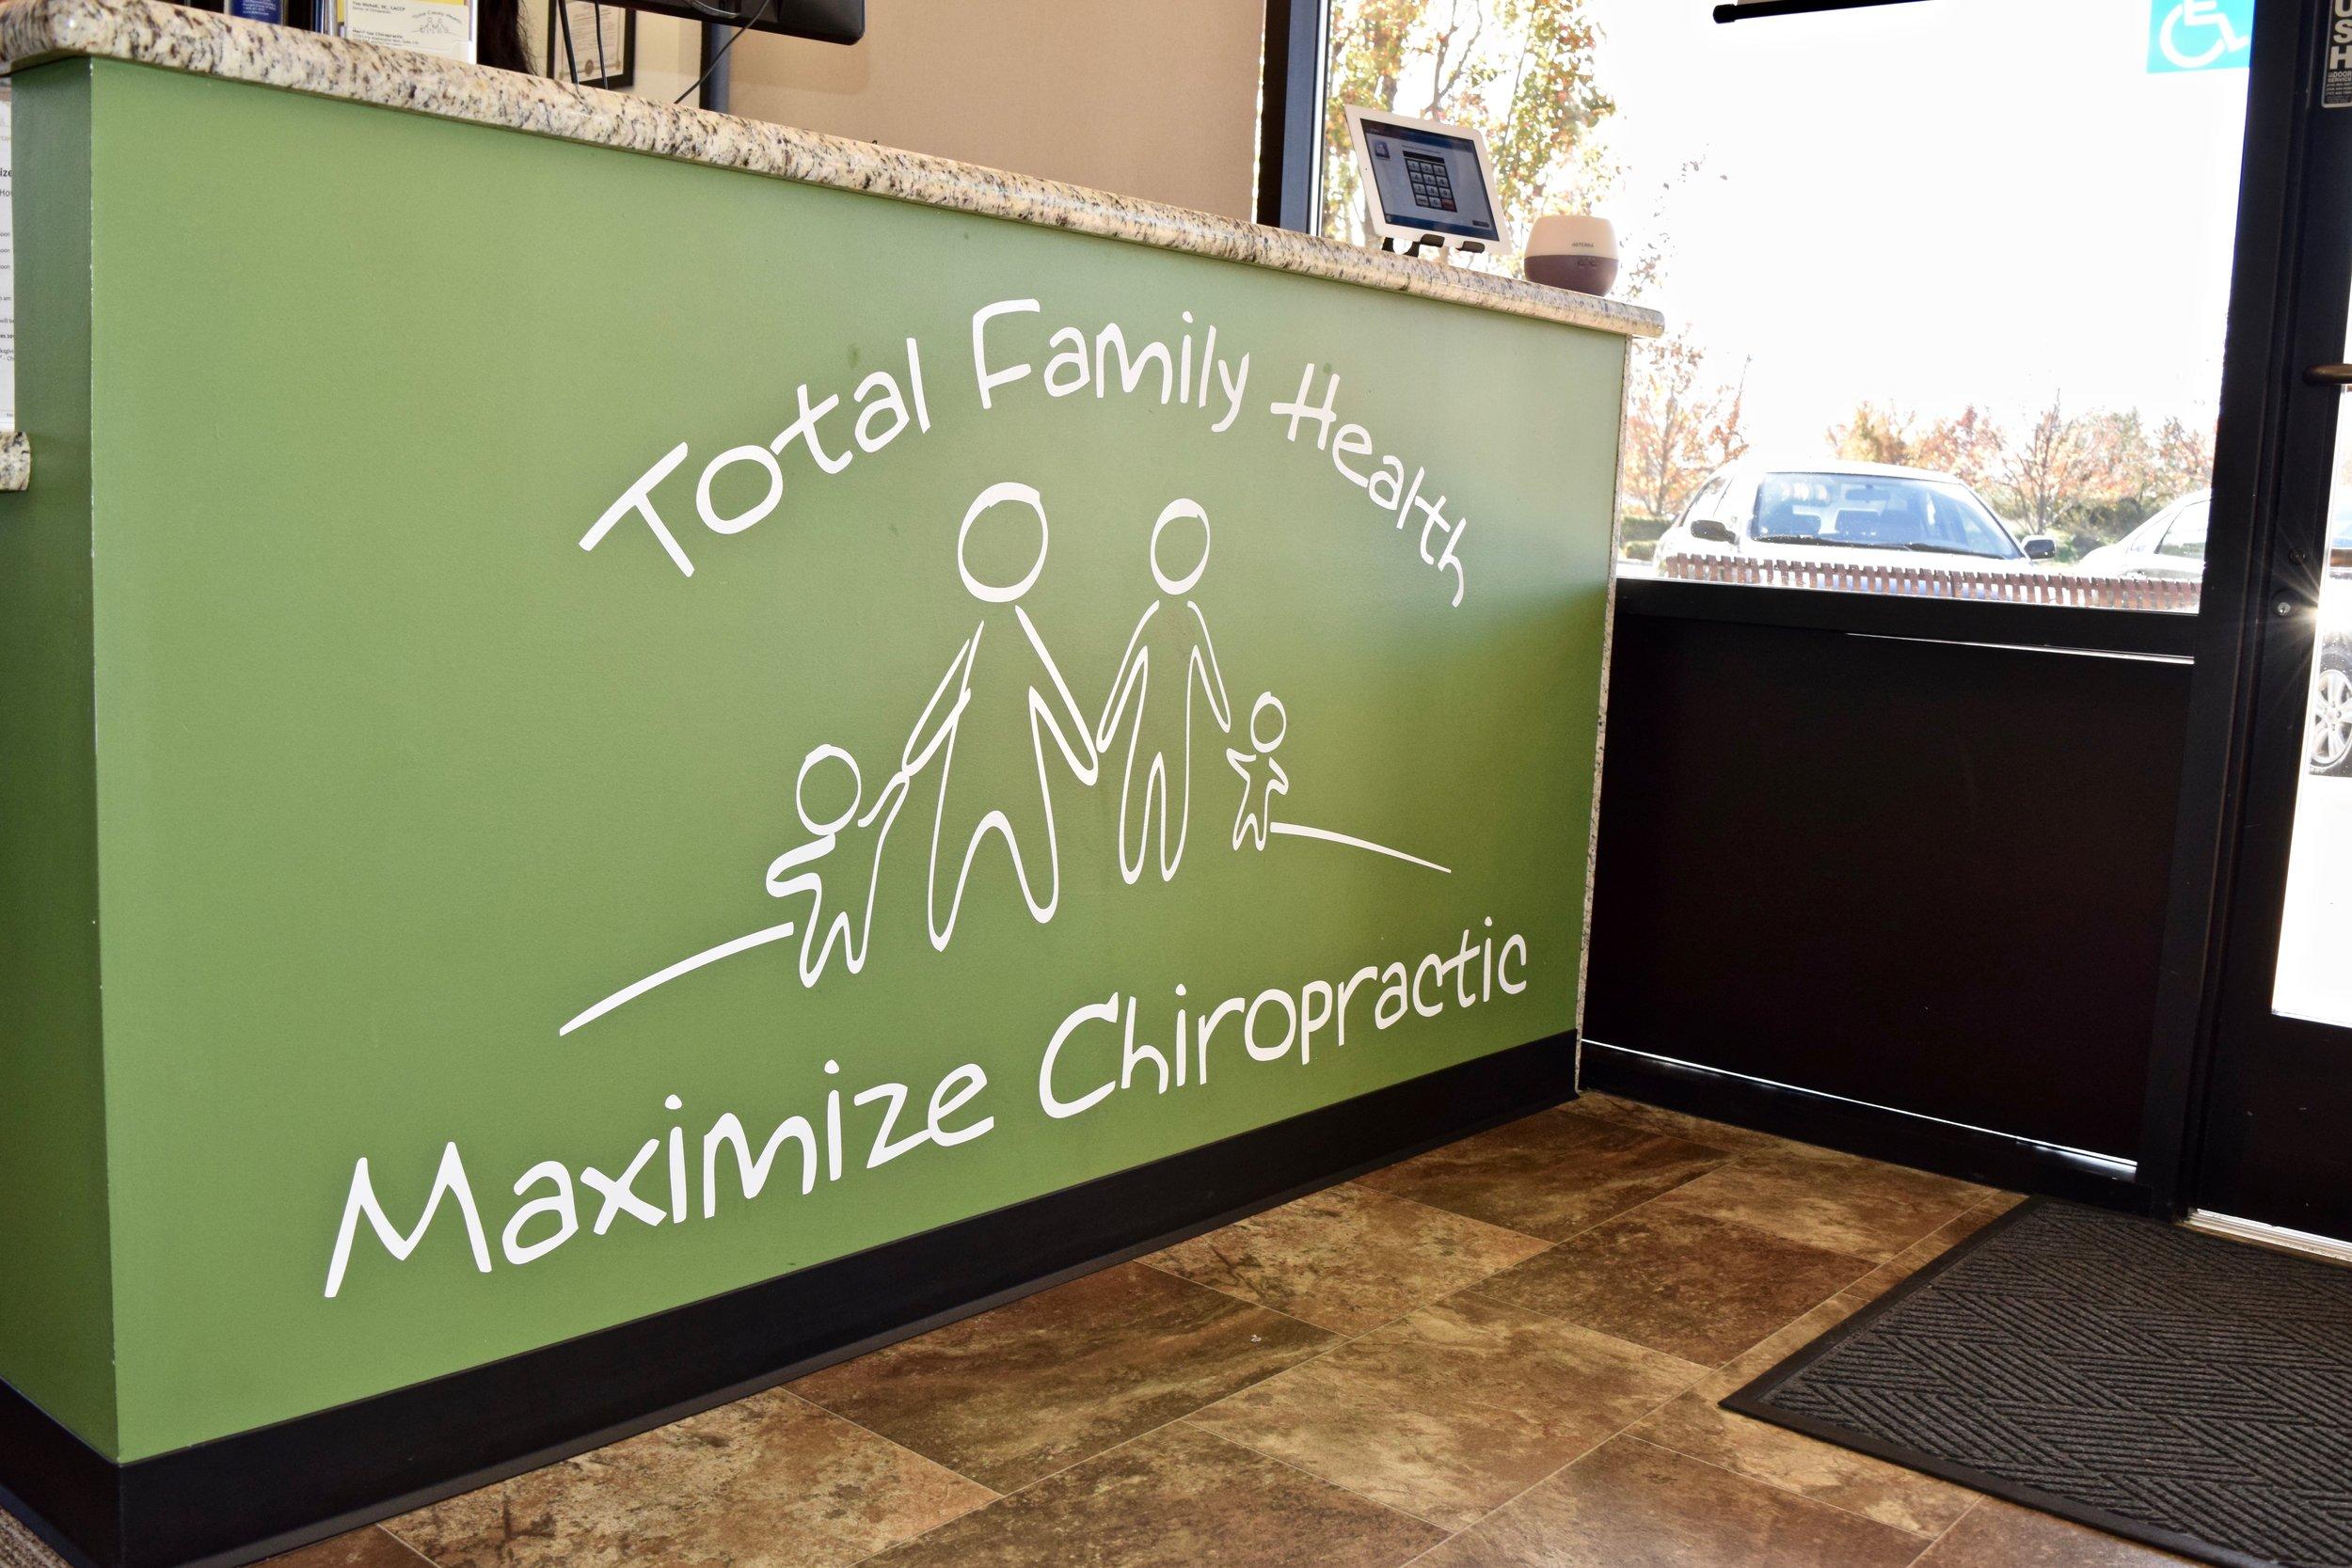 2210 Lake Washington Boulevard, Suite #130 West Sacramento, CA - Monday thru Friday - 8am to 6pmTotal Family Health